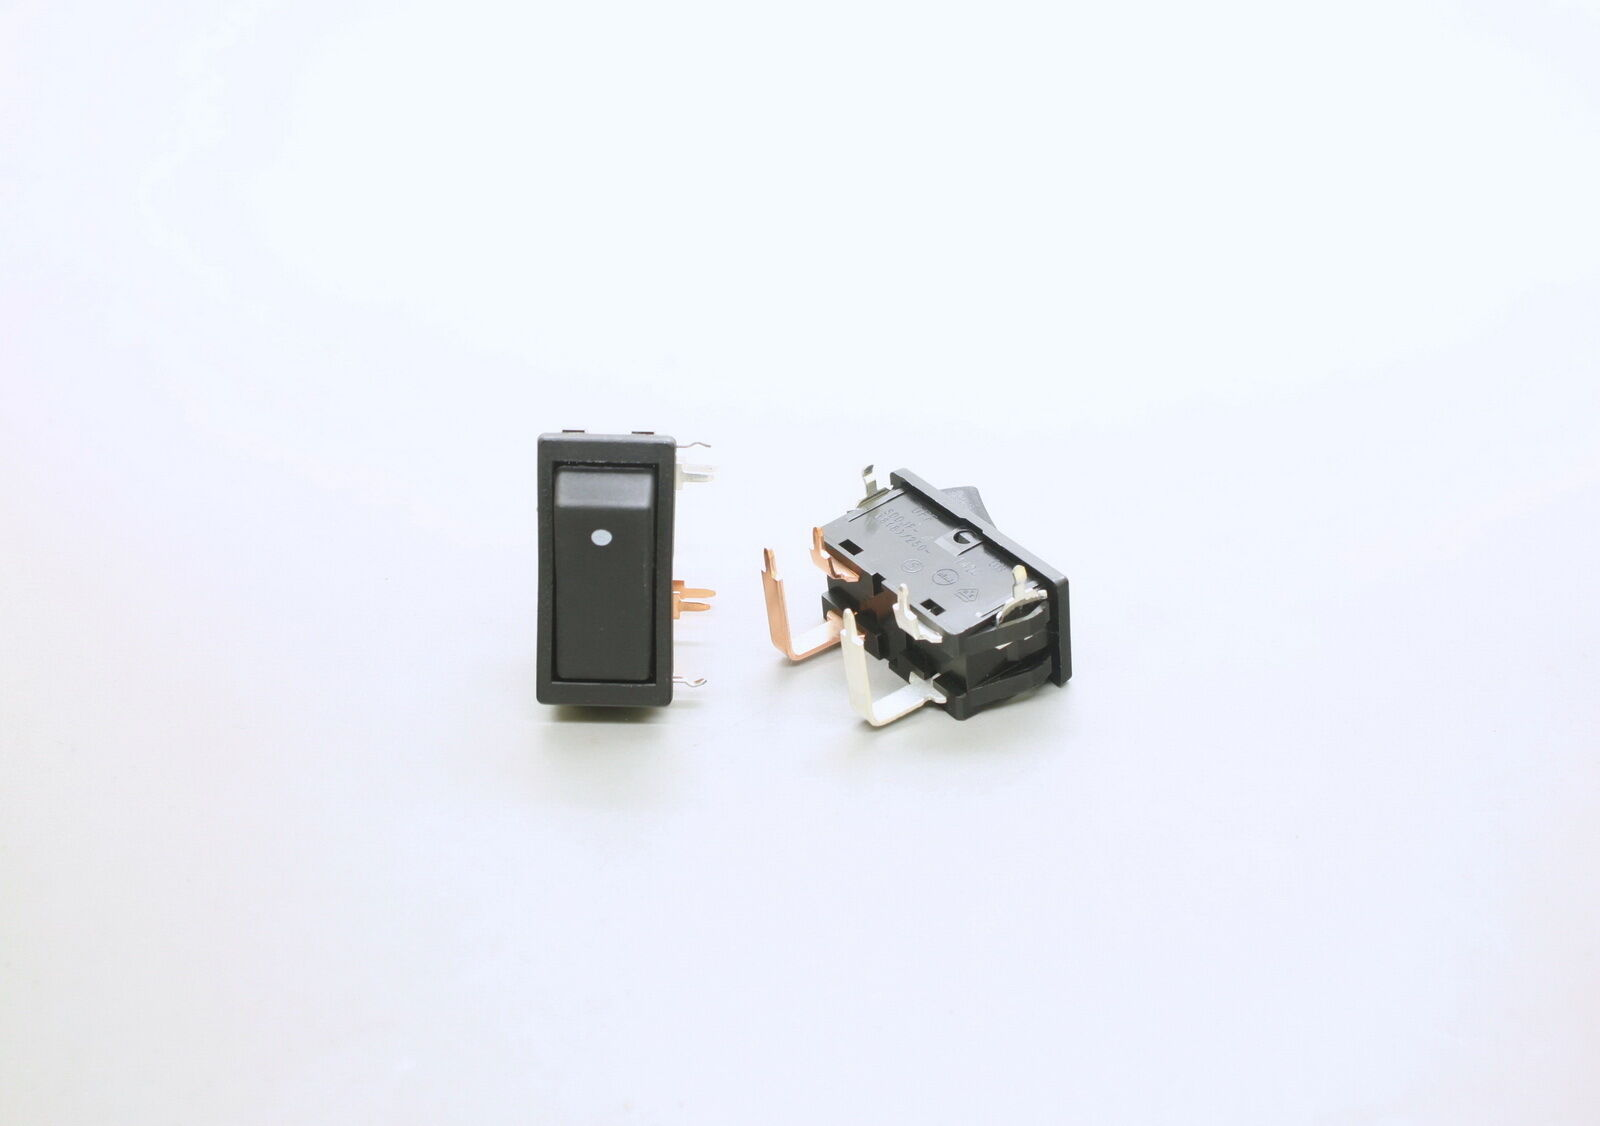 2 X Alps Sddjf Series SDDJF31000 Rocker Switch 16a 250v AC DPST | eBay